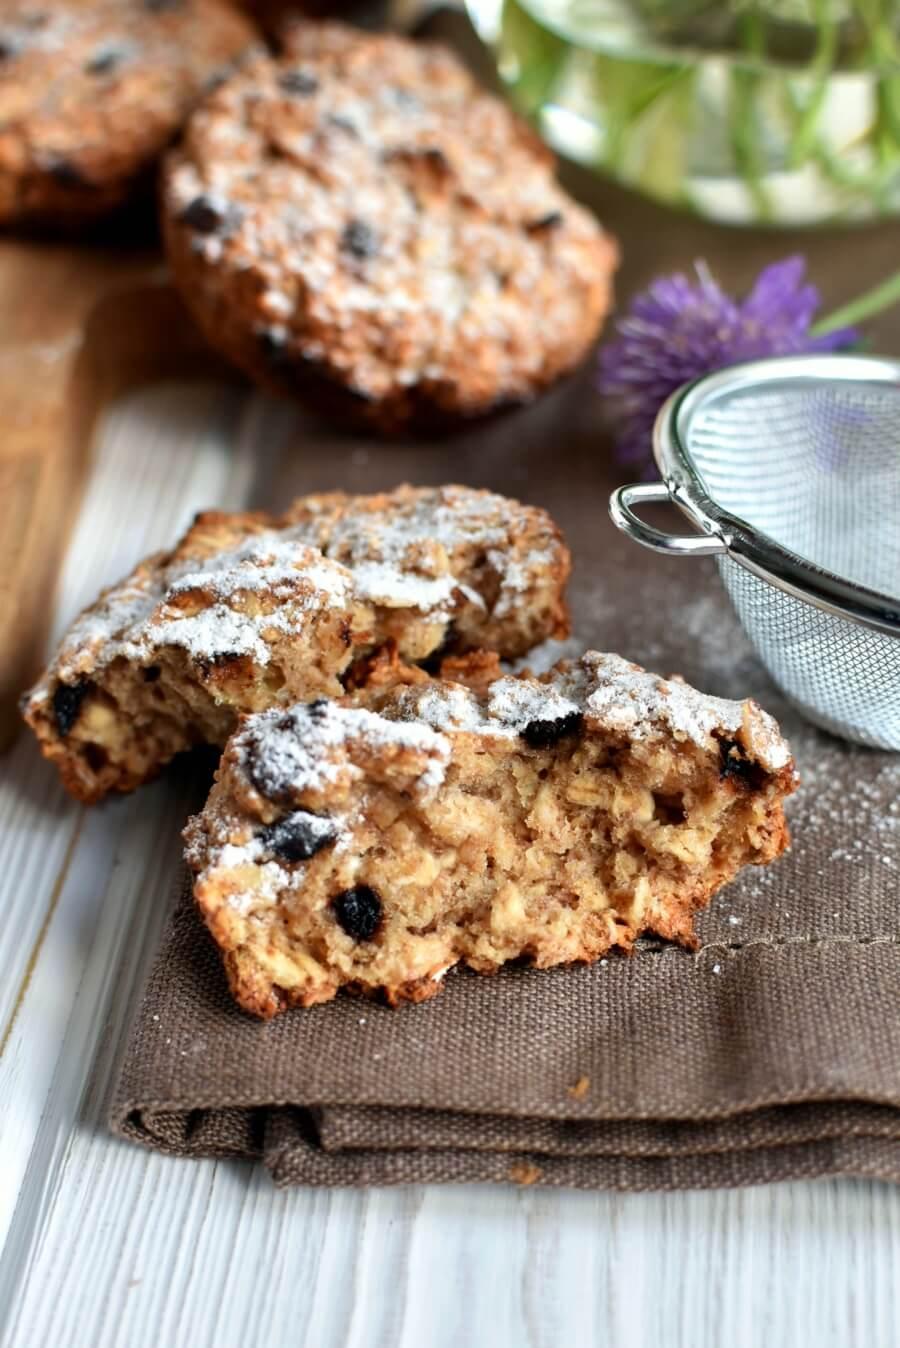 Vegan Banana Bread Breakfast Muffins Recipe - Cook.me Recipes